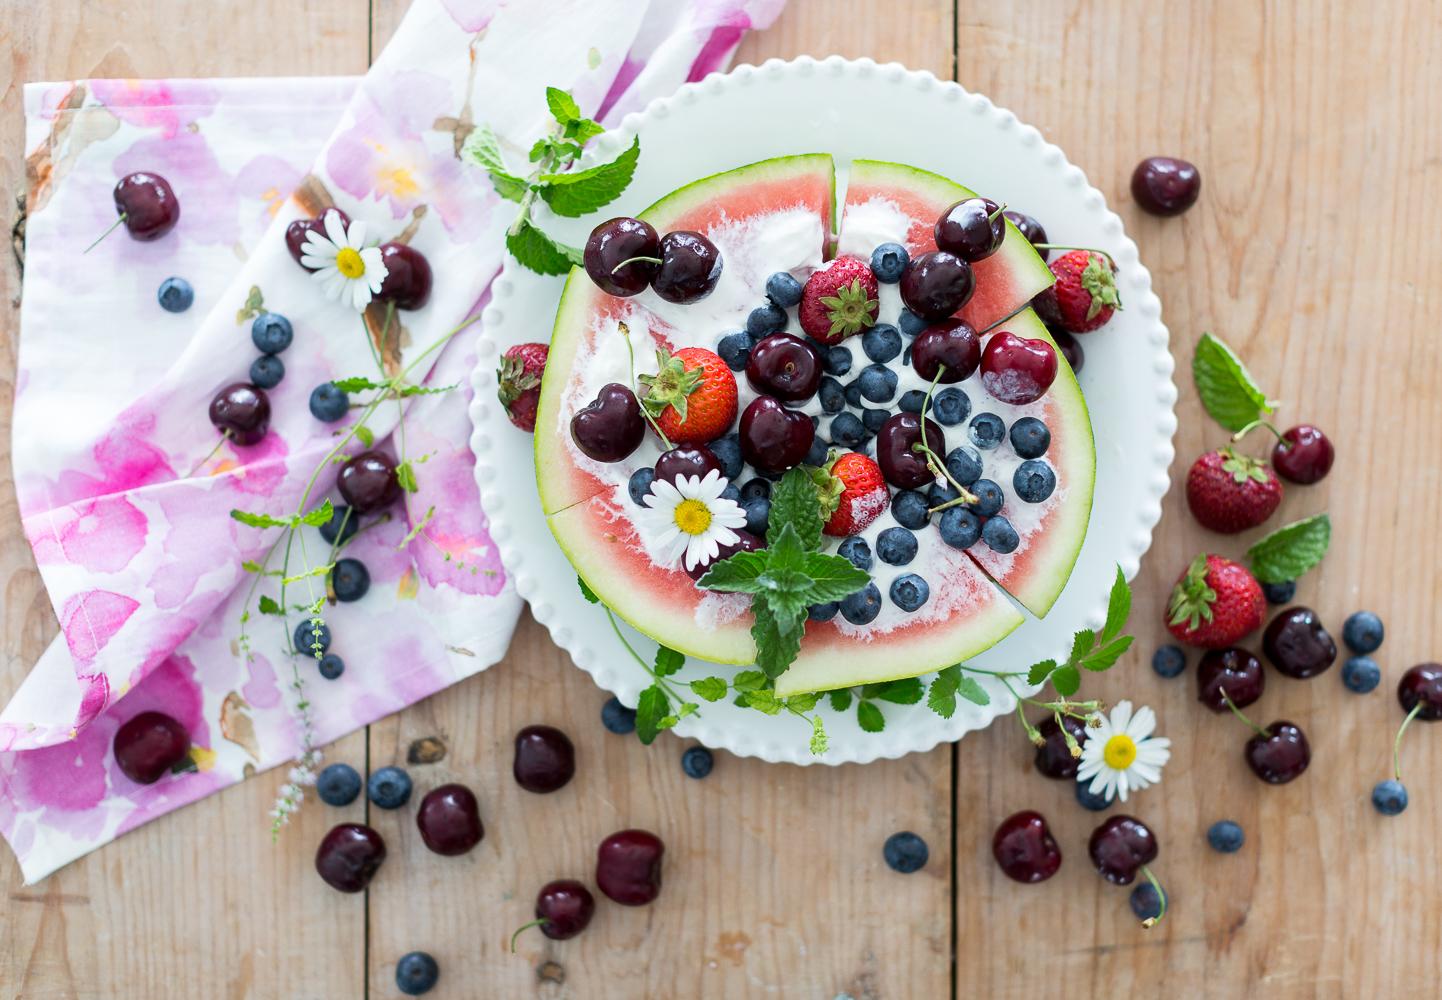 watermelonpizzacraftberrybush